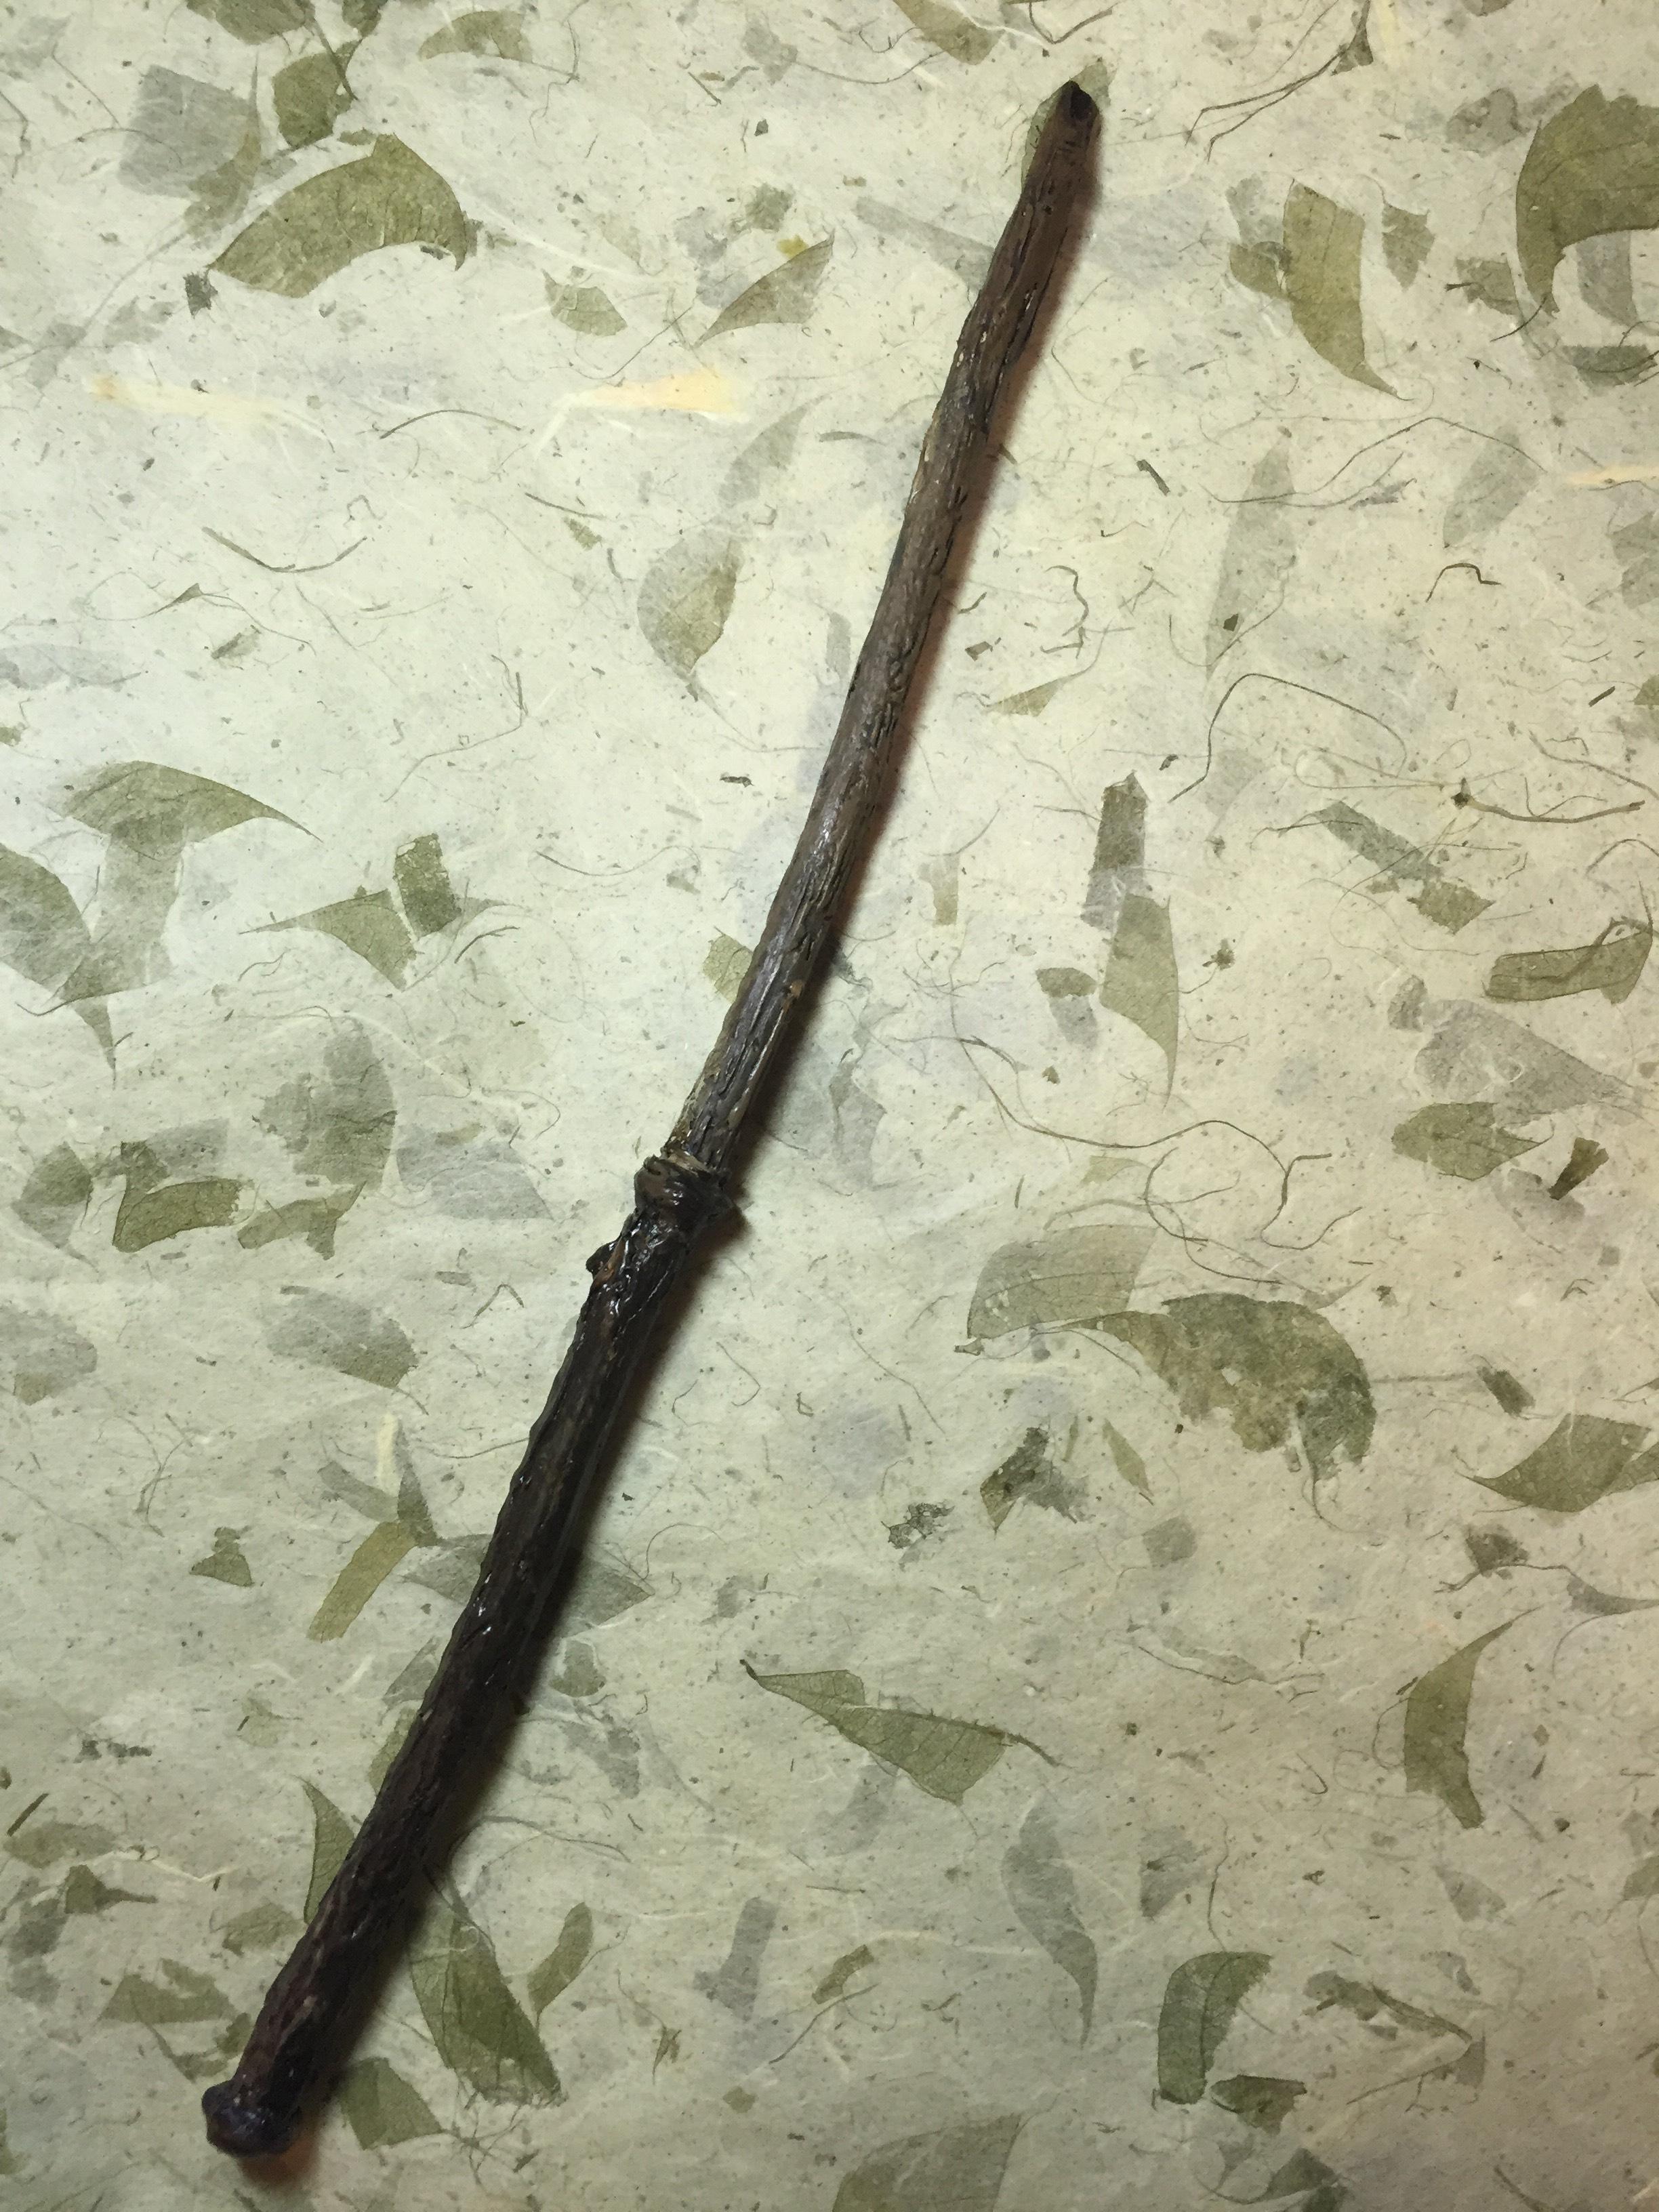 DIY-Harry Potter Wand